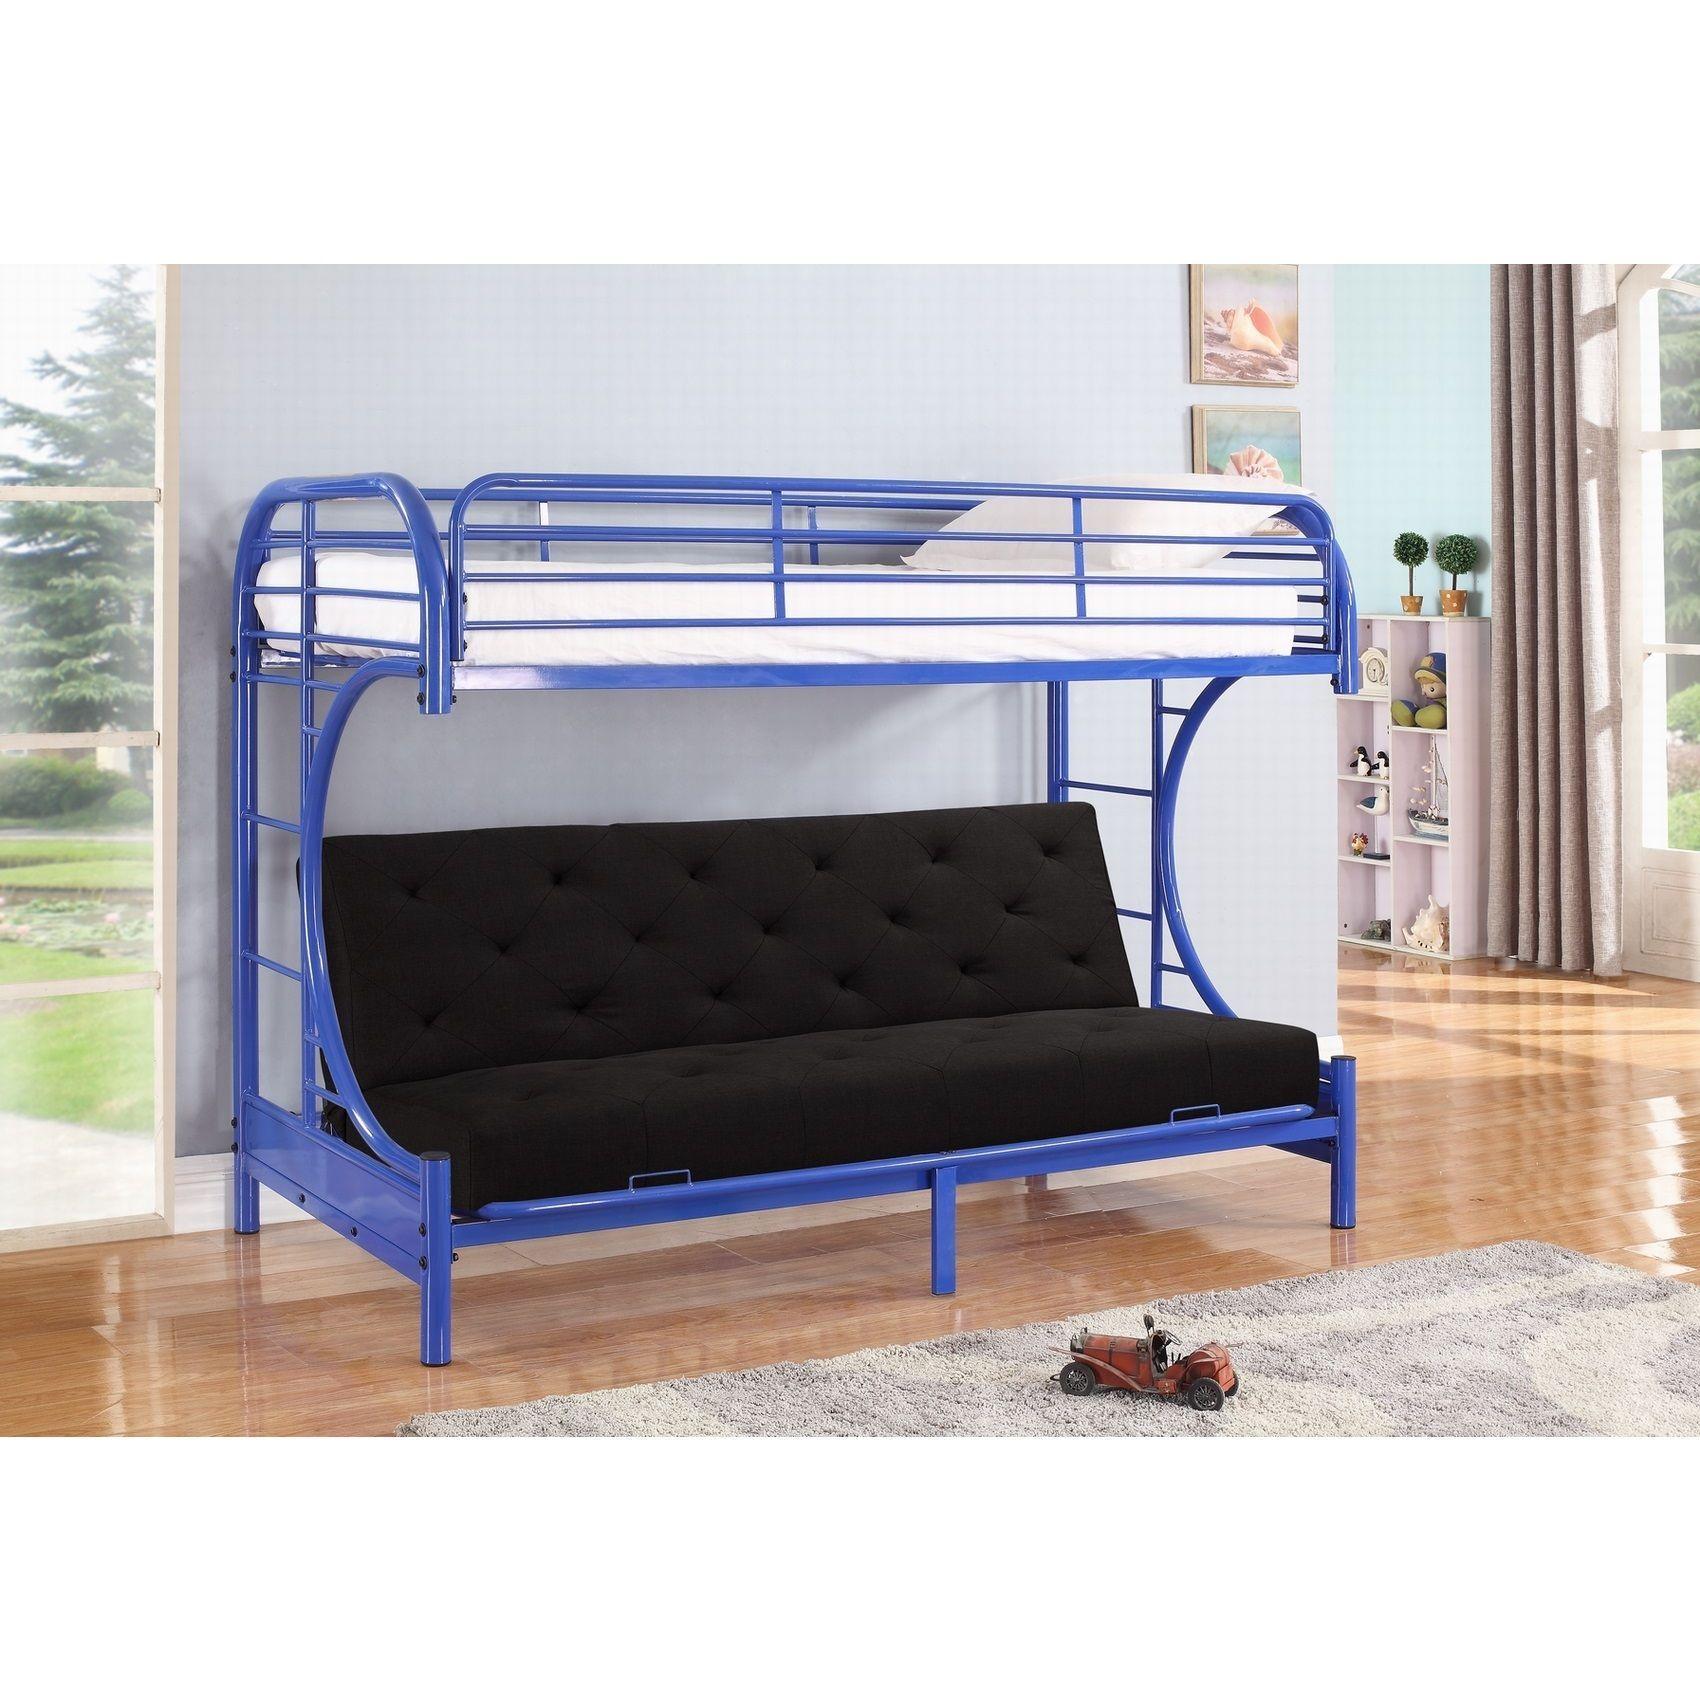 jordan twin c shaped blue metal futon and bunkbed  bo by nathaniel home  jordan jordan twin c shaped blue metal futon and bunkbed  bo by      rh   pinterest